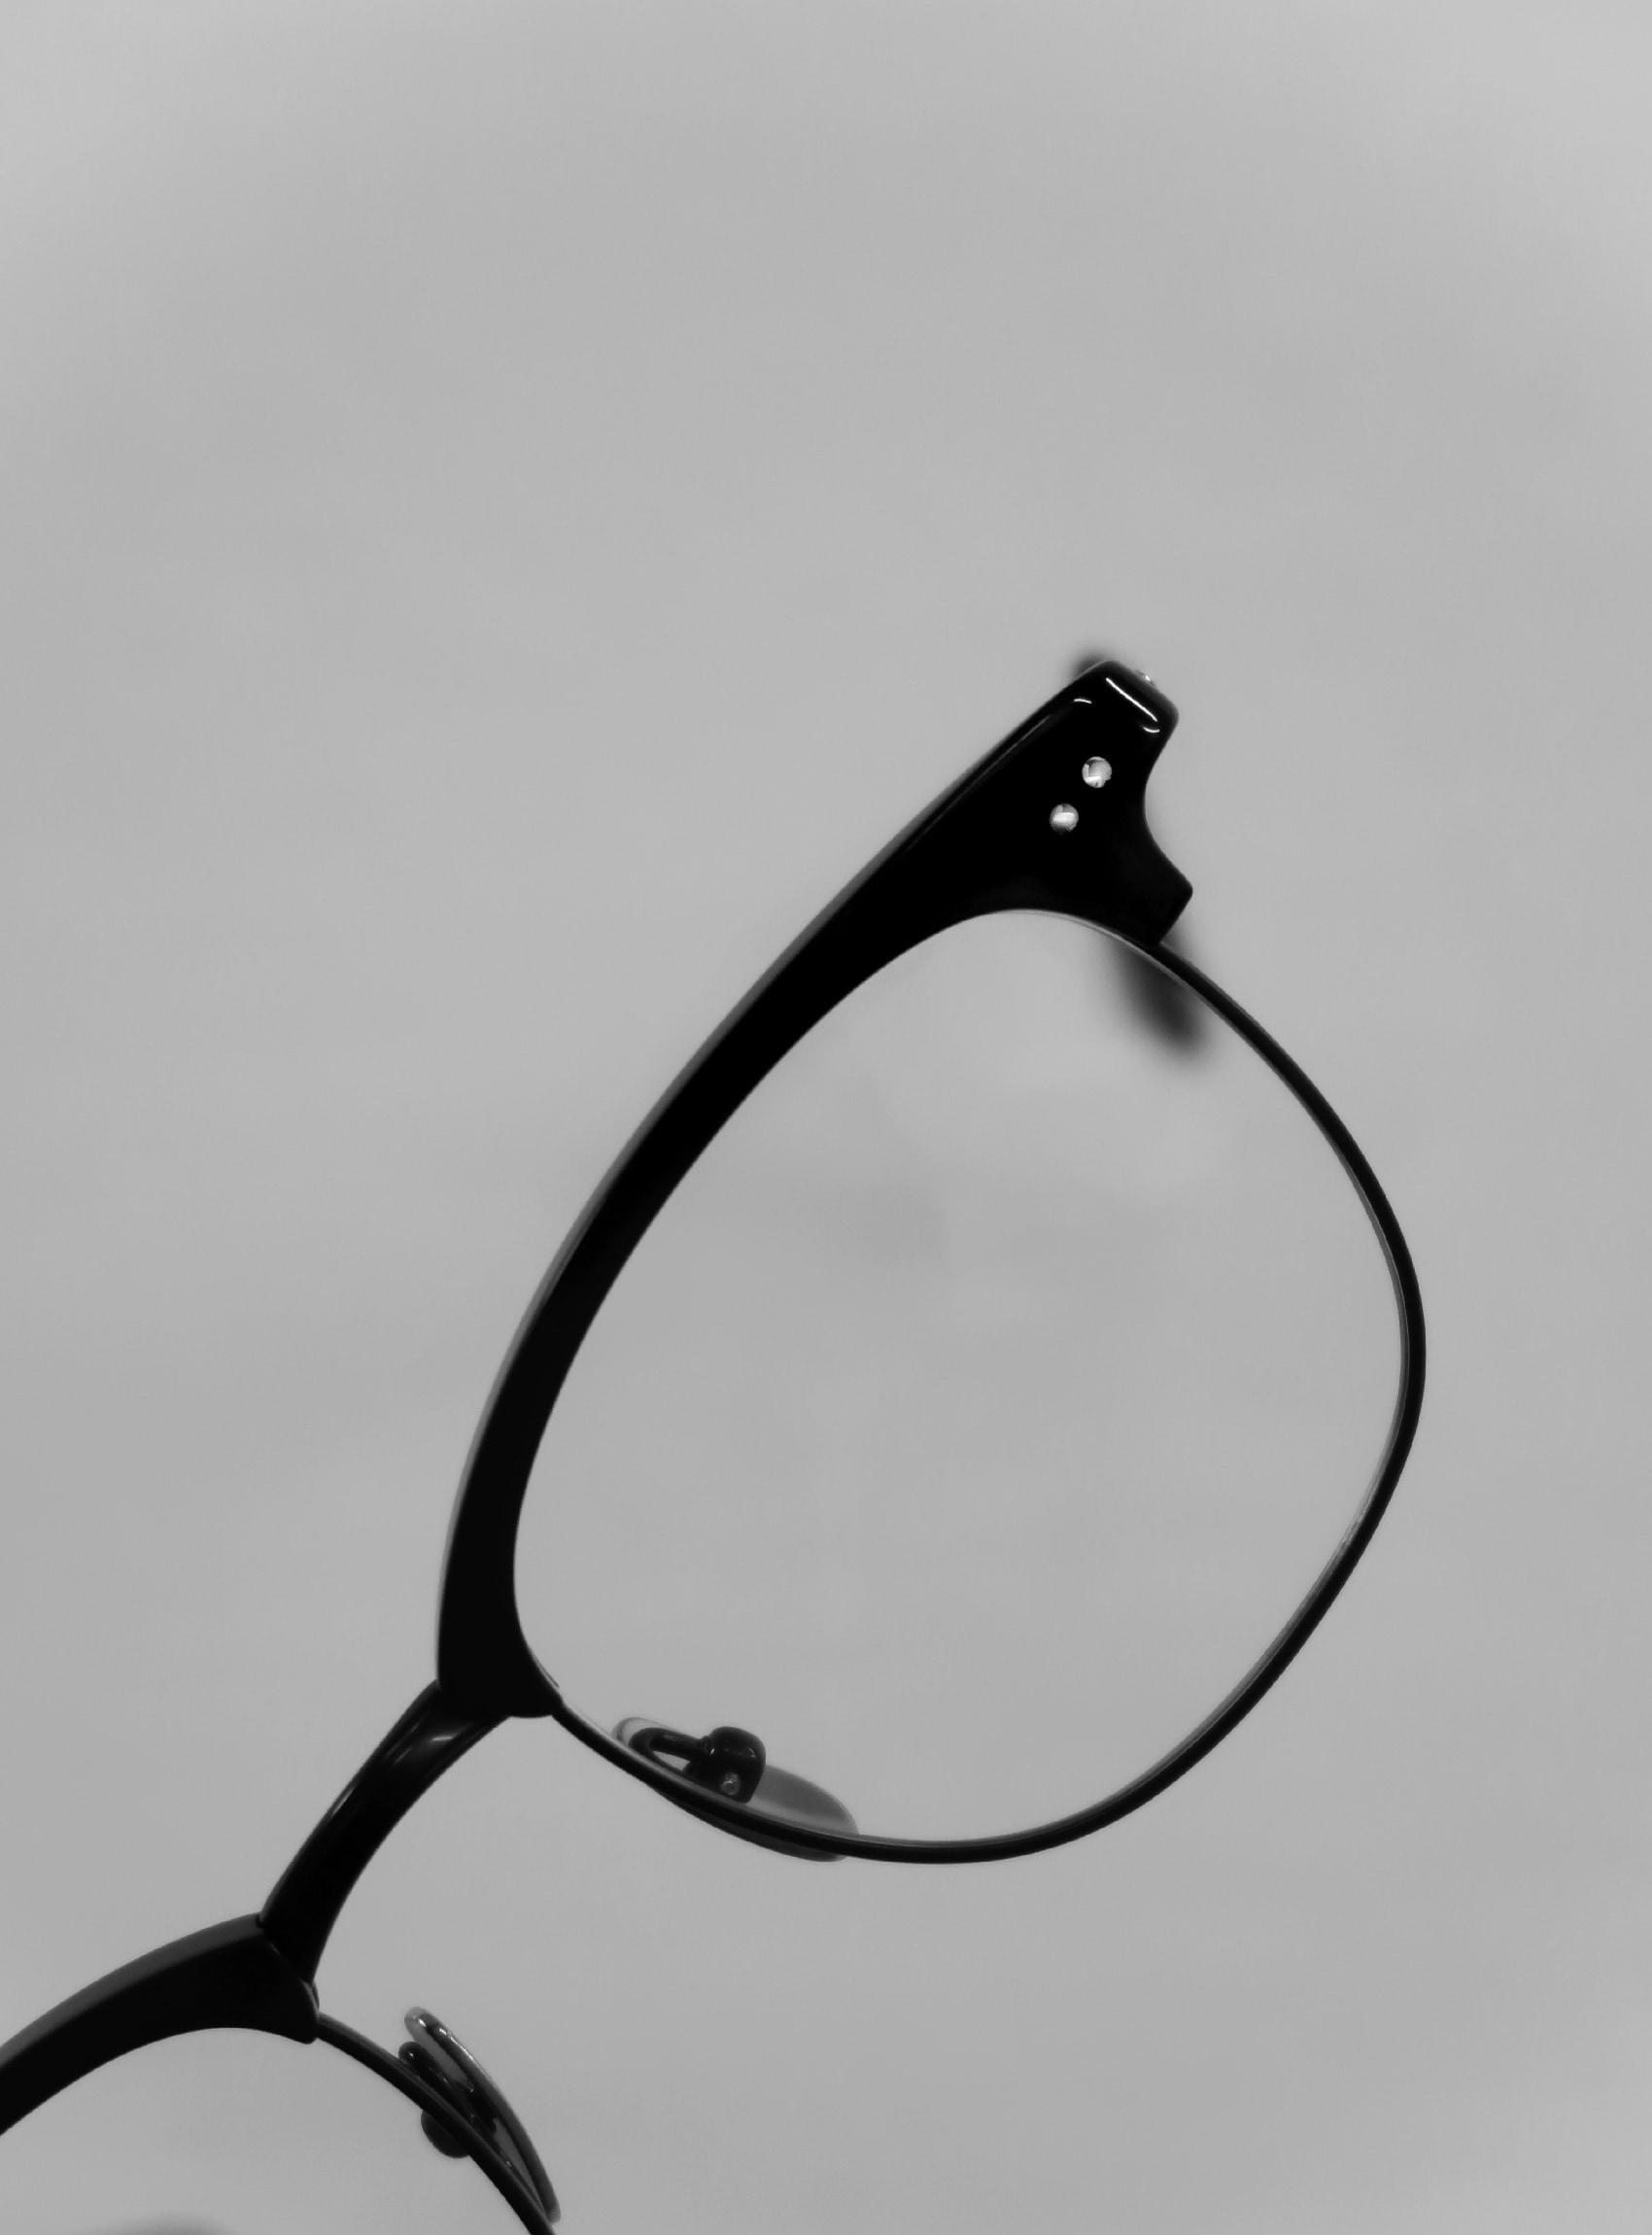 180327-yp-kelvin